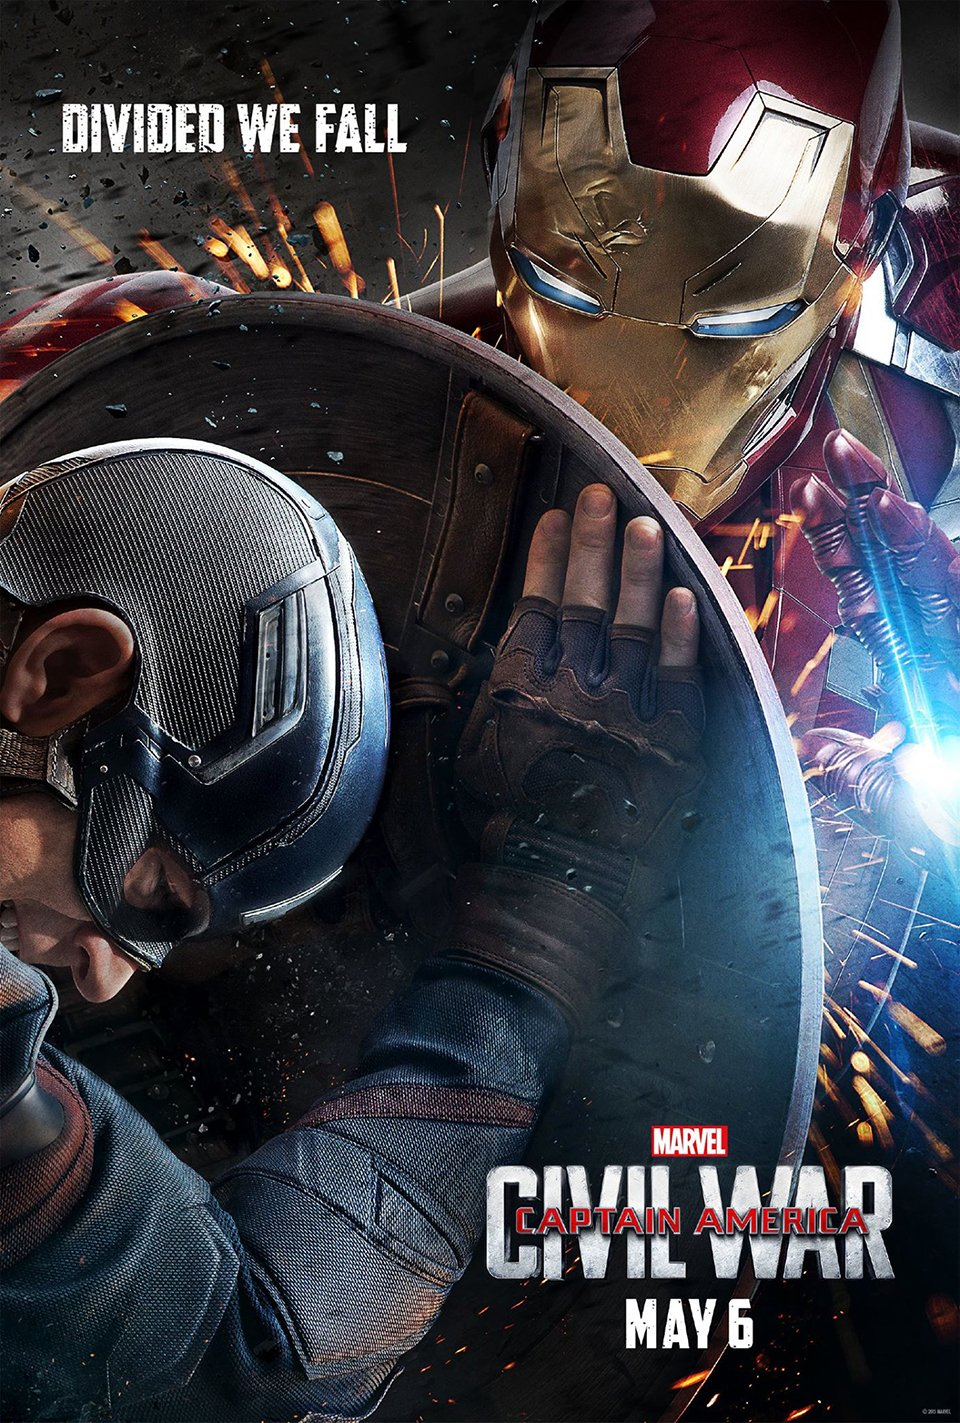 Capt. America: Civil War (Trailer)